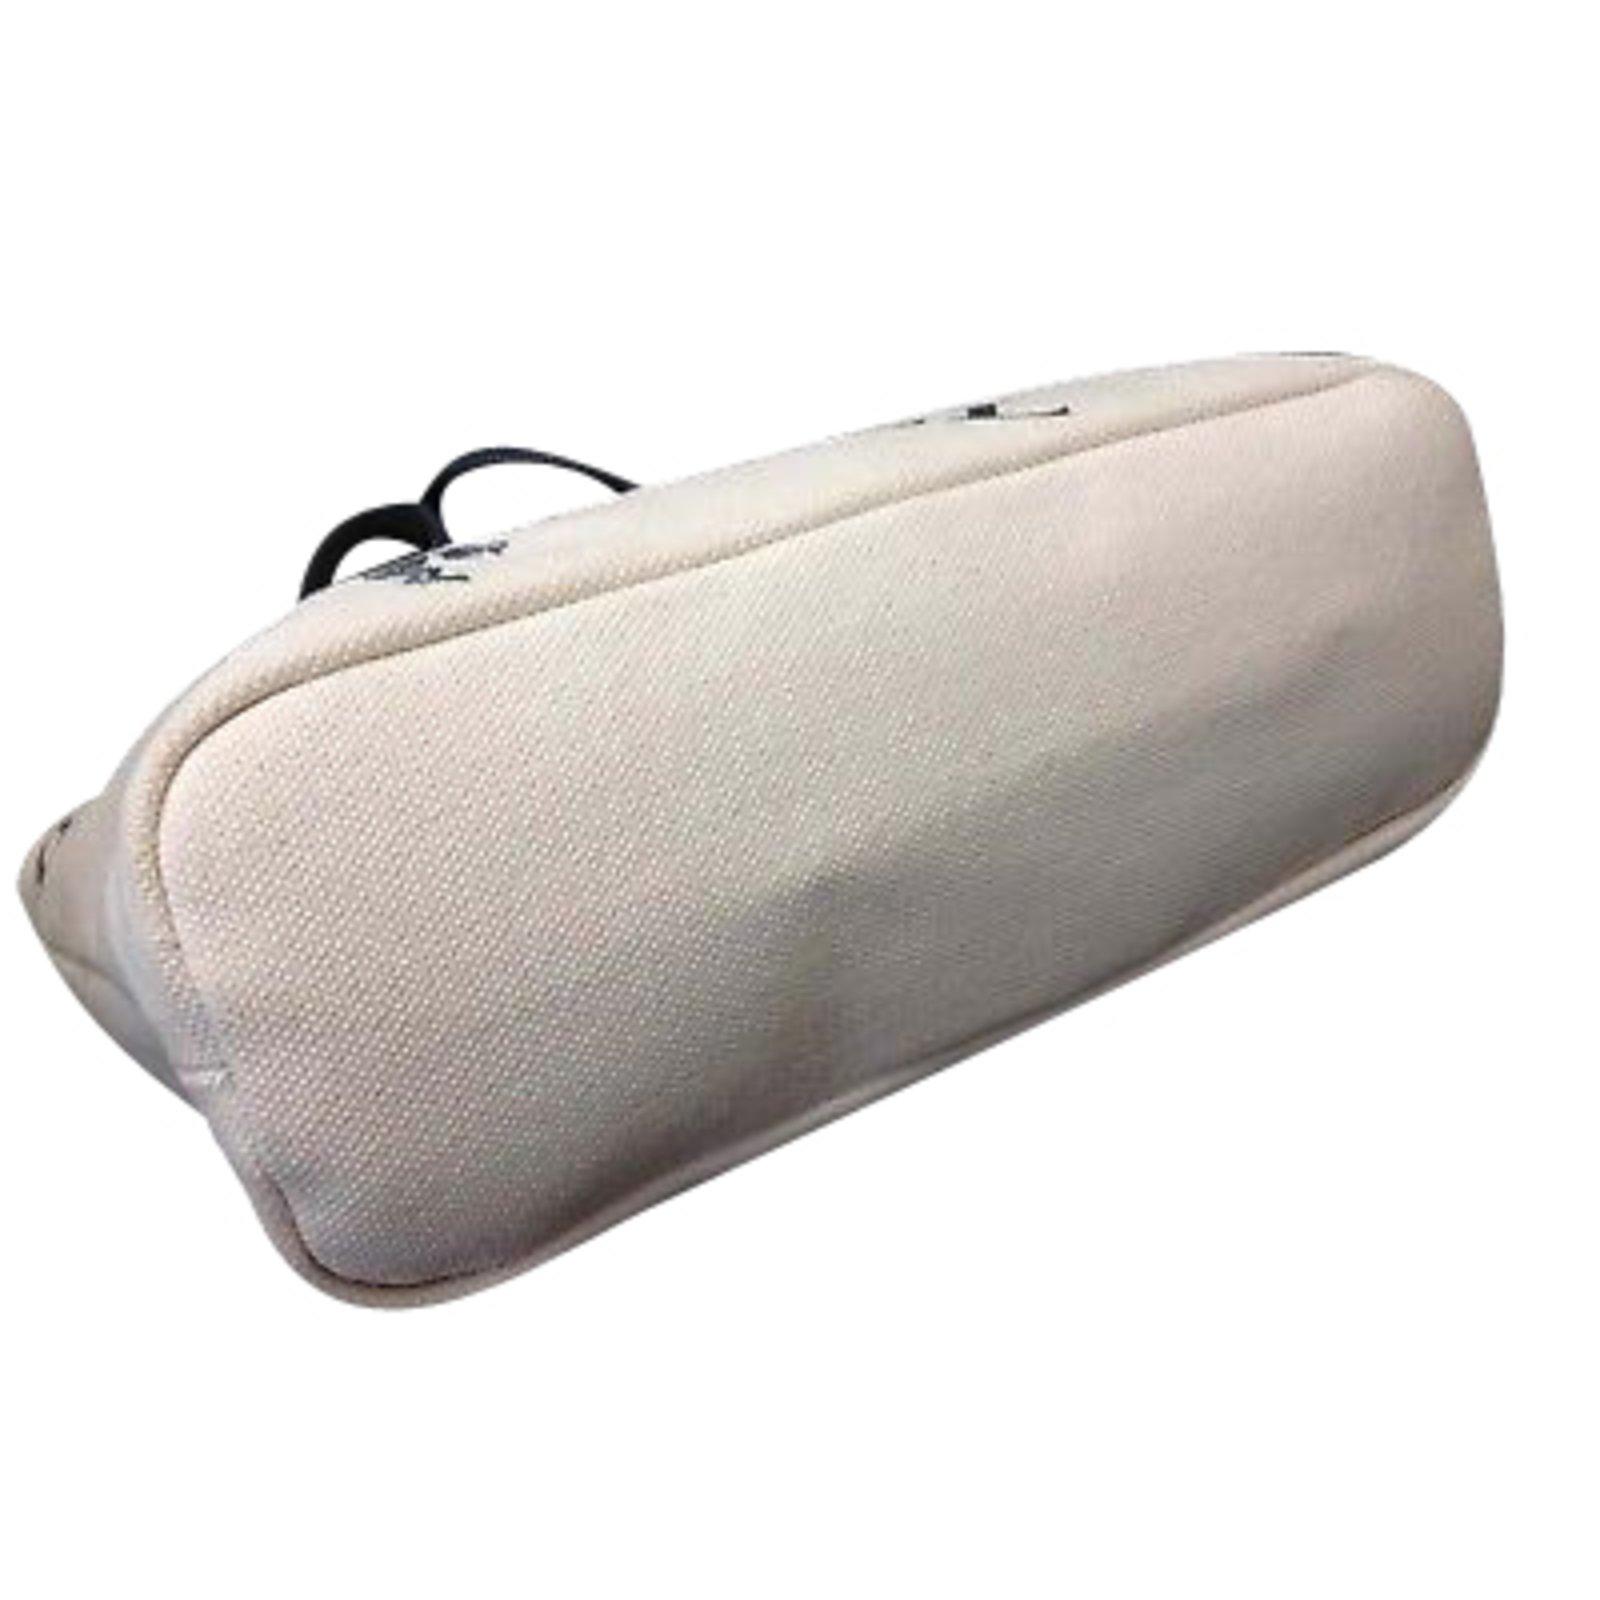 3fb027304e3c Facebook · Pin This. Burberry Blue Label Shoulder Bag Handbags Cotton Beige  ...